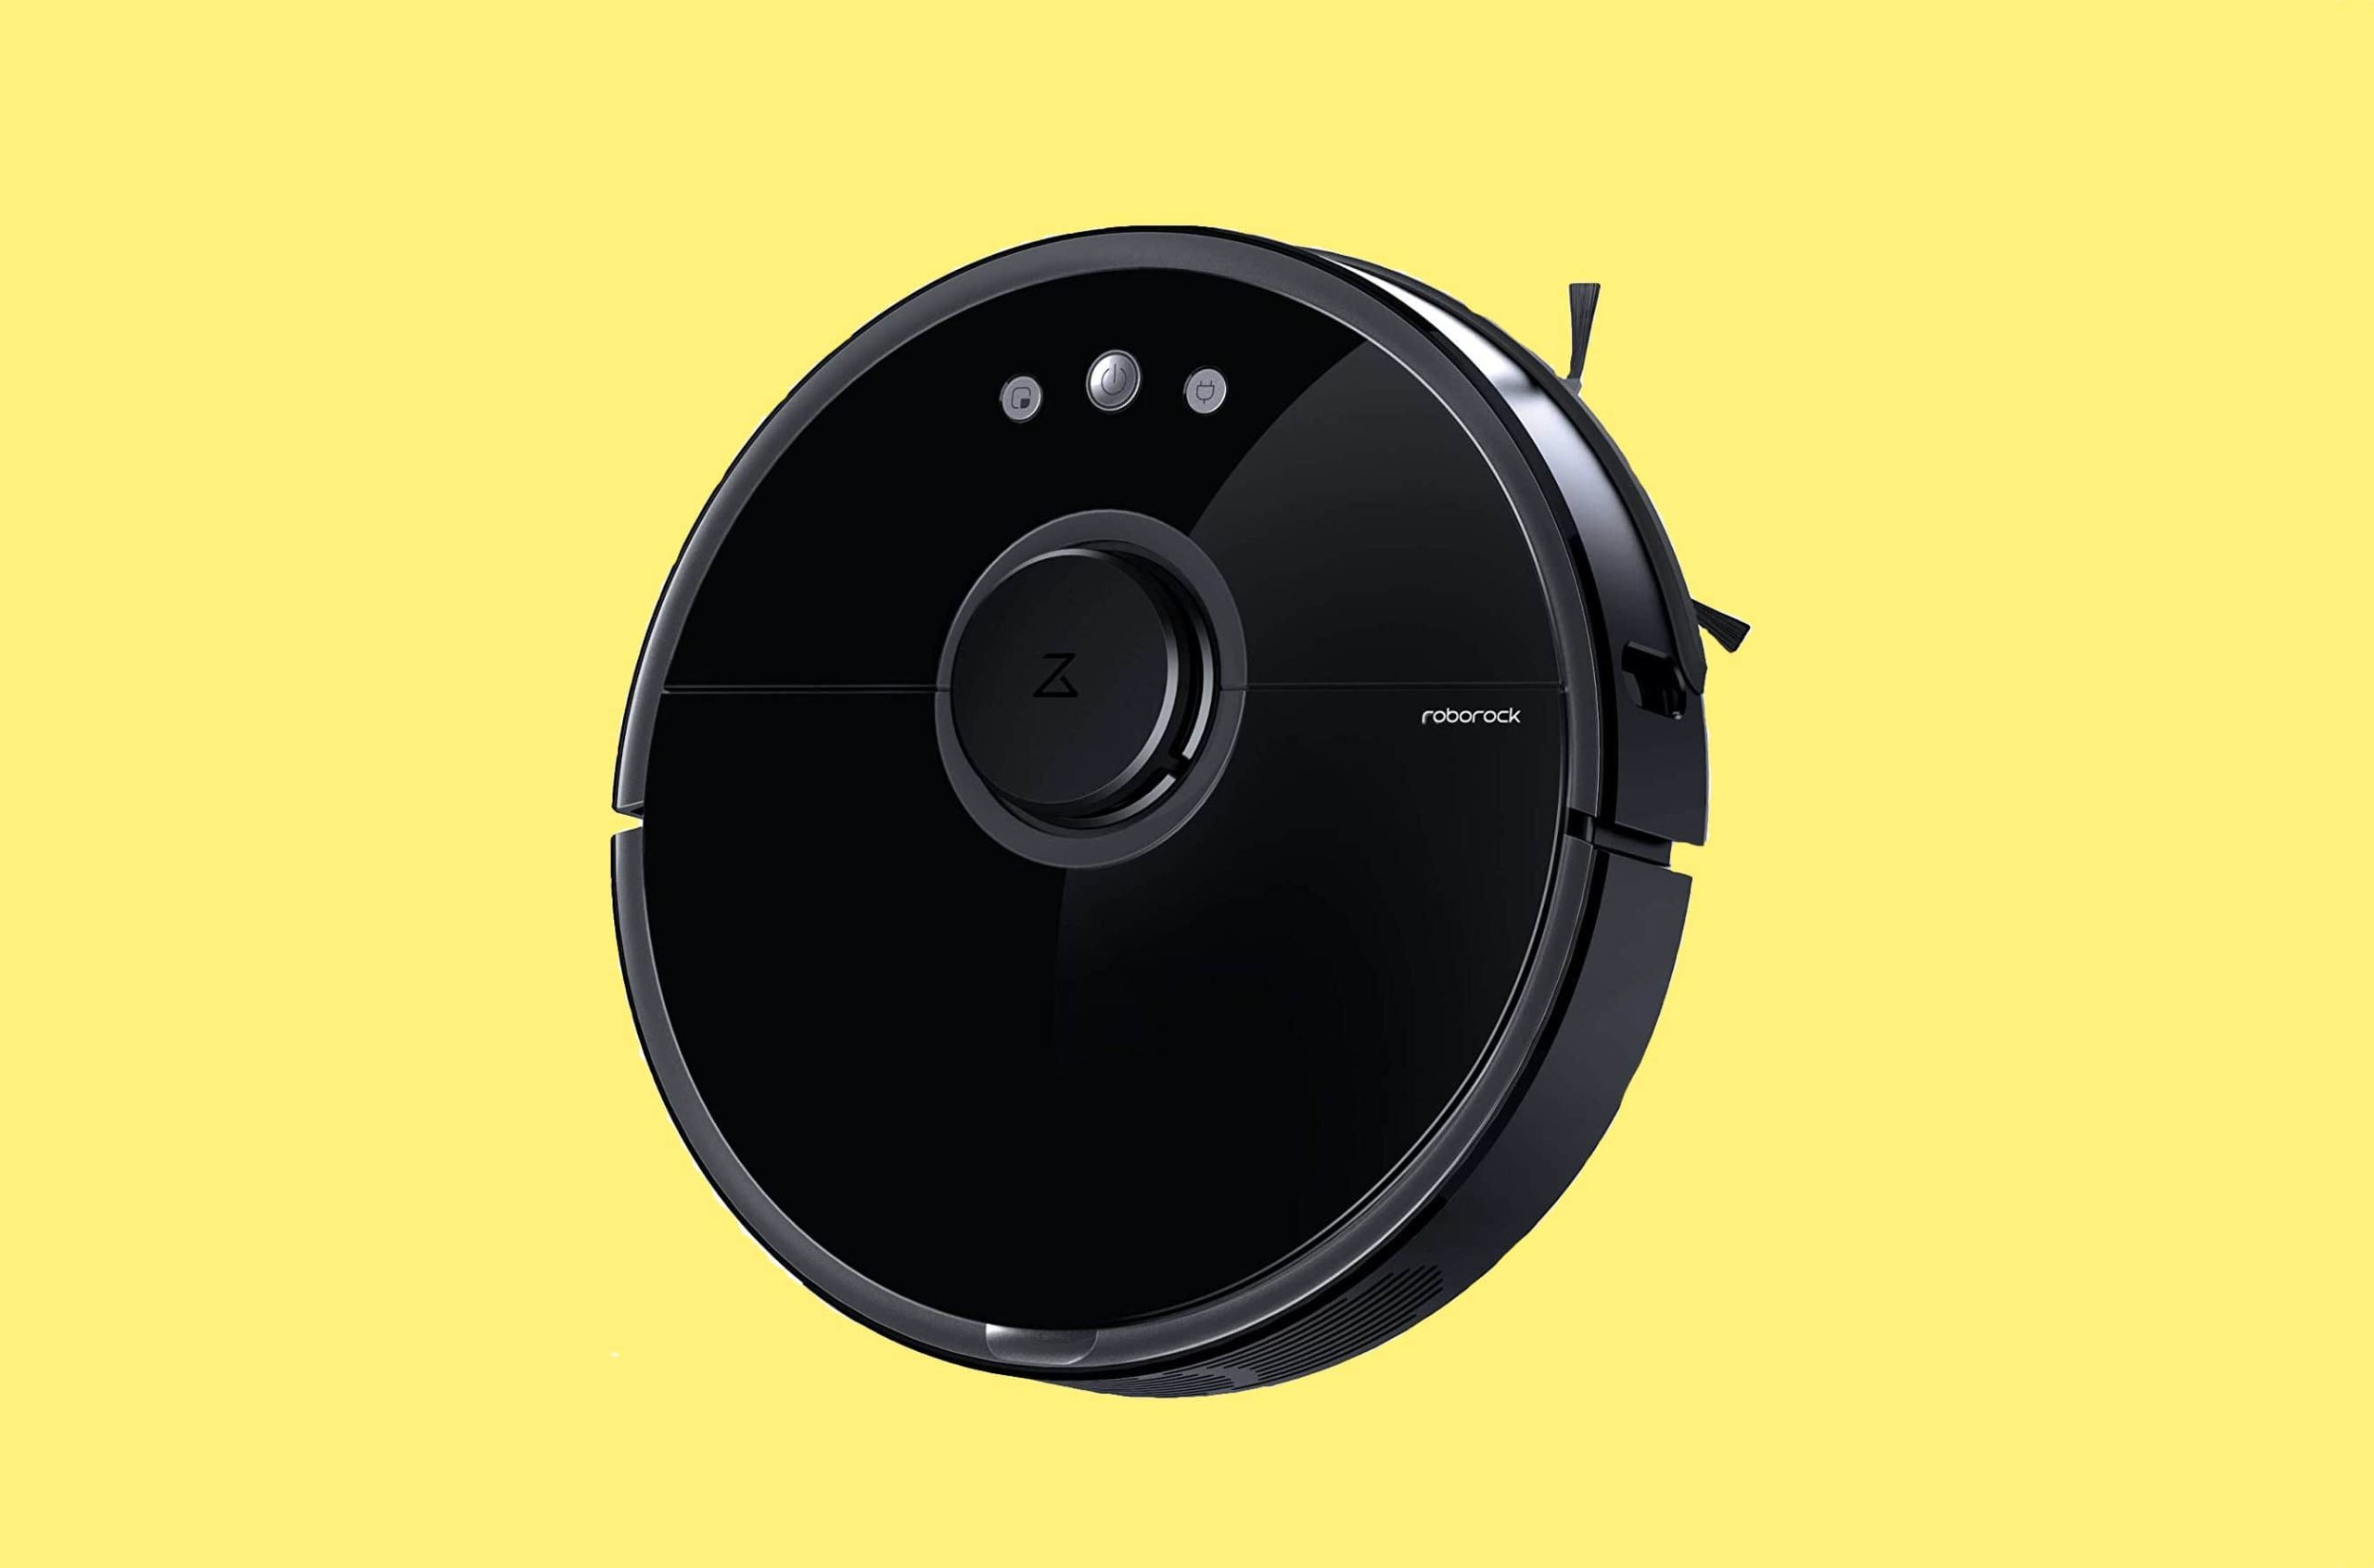 _Roborock S5 Robot Vacuum and Mop-min (1)